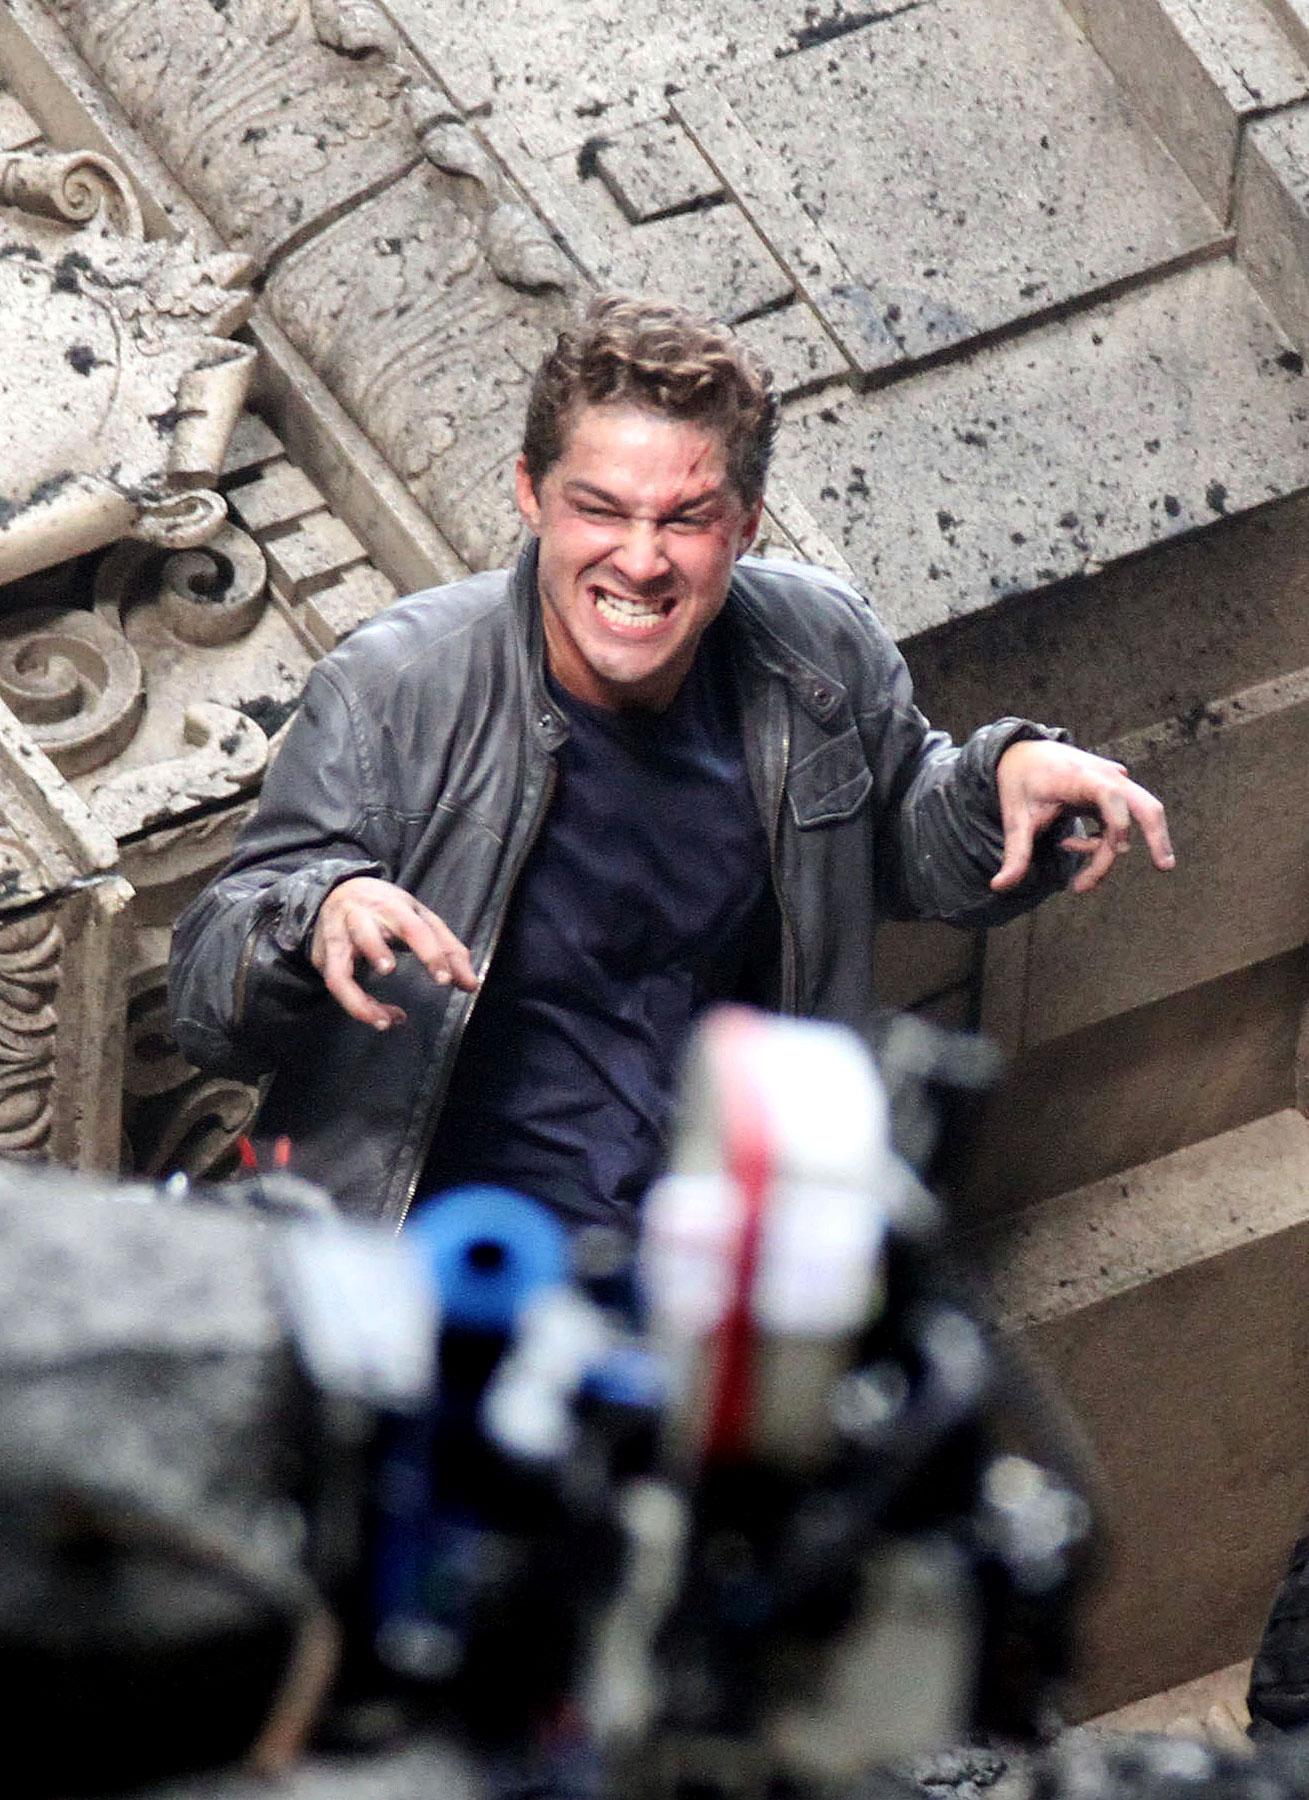 Shia LaBeouf Goes Berserk on 'Transformers 3′ Set! (PHOTOS)